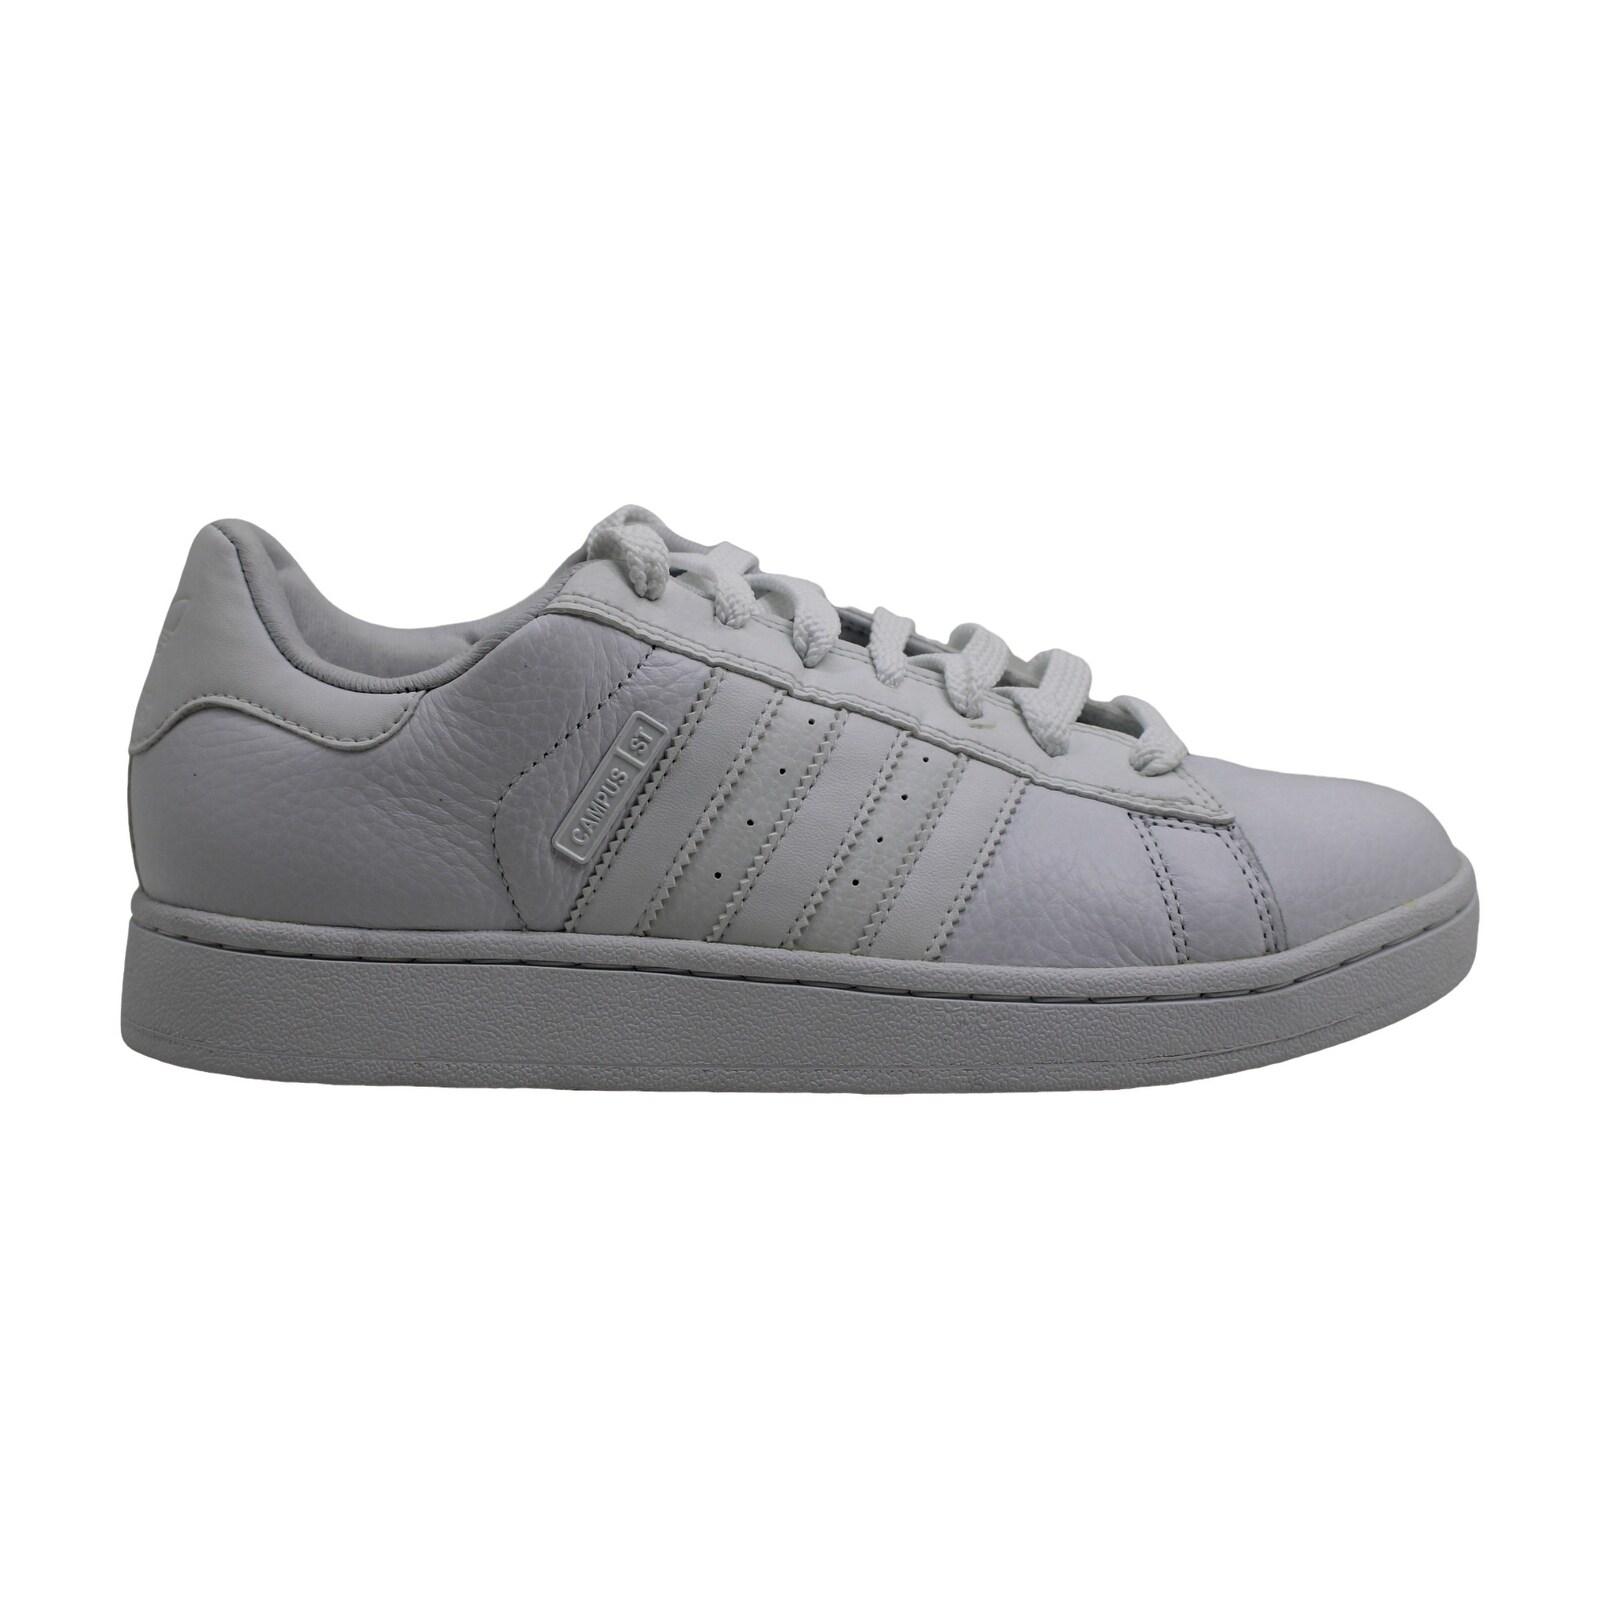 adidas men's campus sneakers